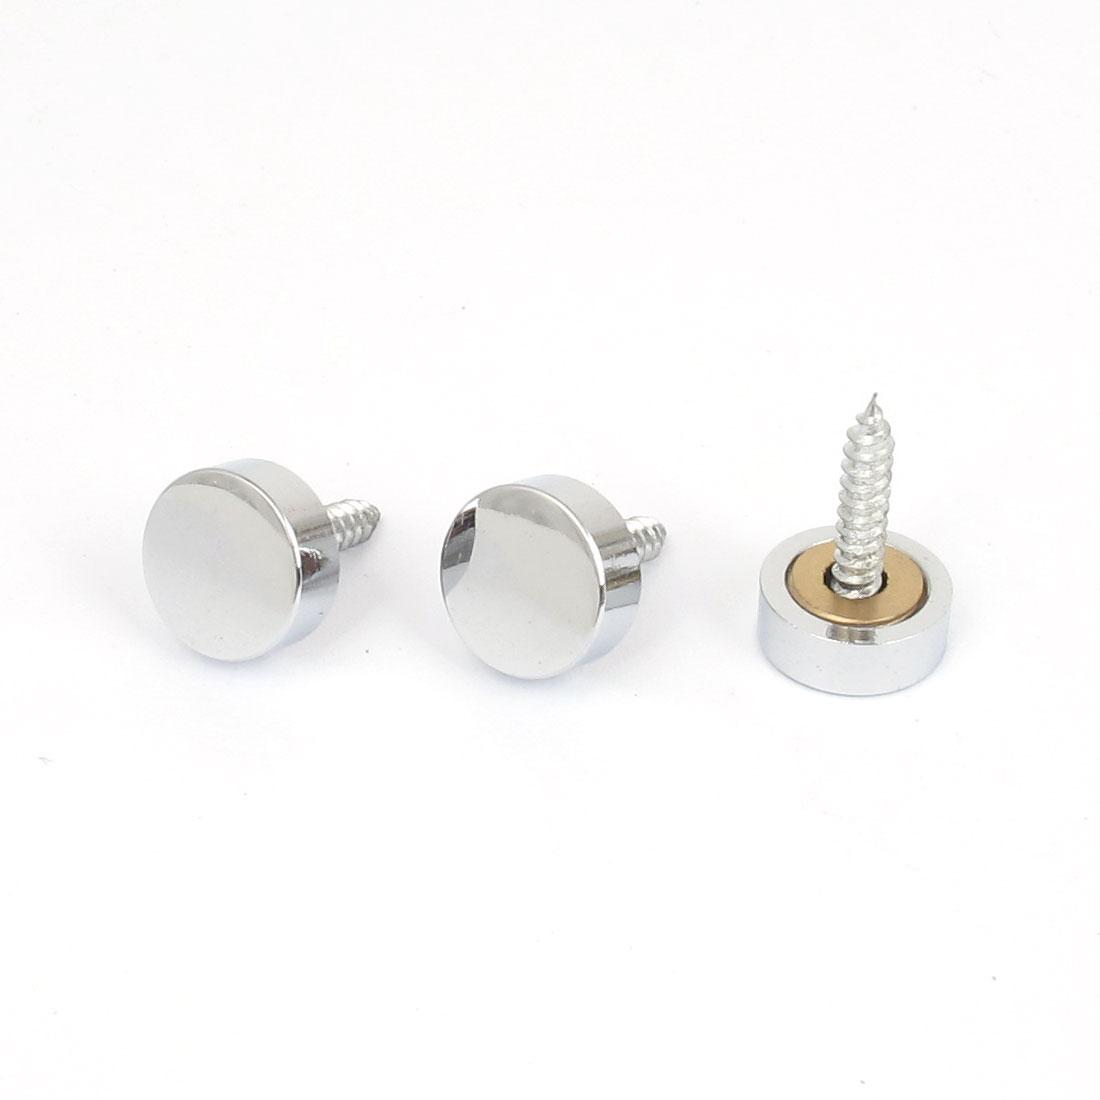 14mm x 5mm Glass Tea Table Decorative Metal Mirror Screw Nails Silver Tone 3pcs